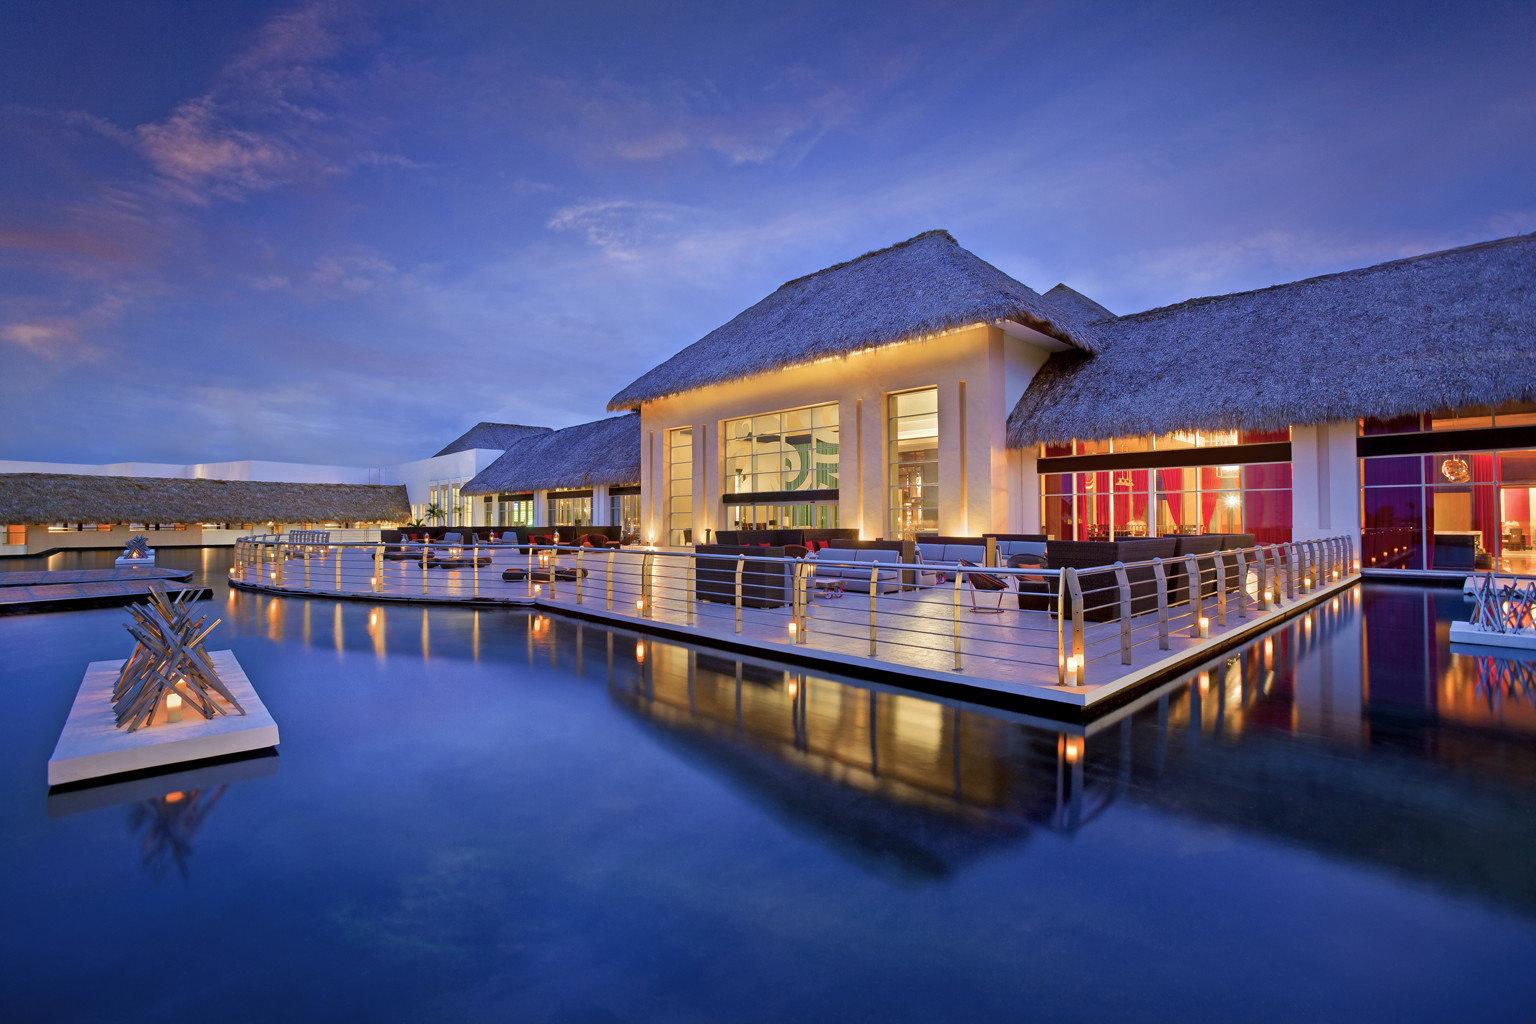 Elegant Hip Luxury Modern Pool sky water scene house night home evening Resort swimming pool dock dusk marina boathouse waterway